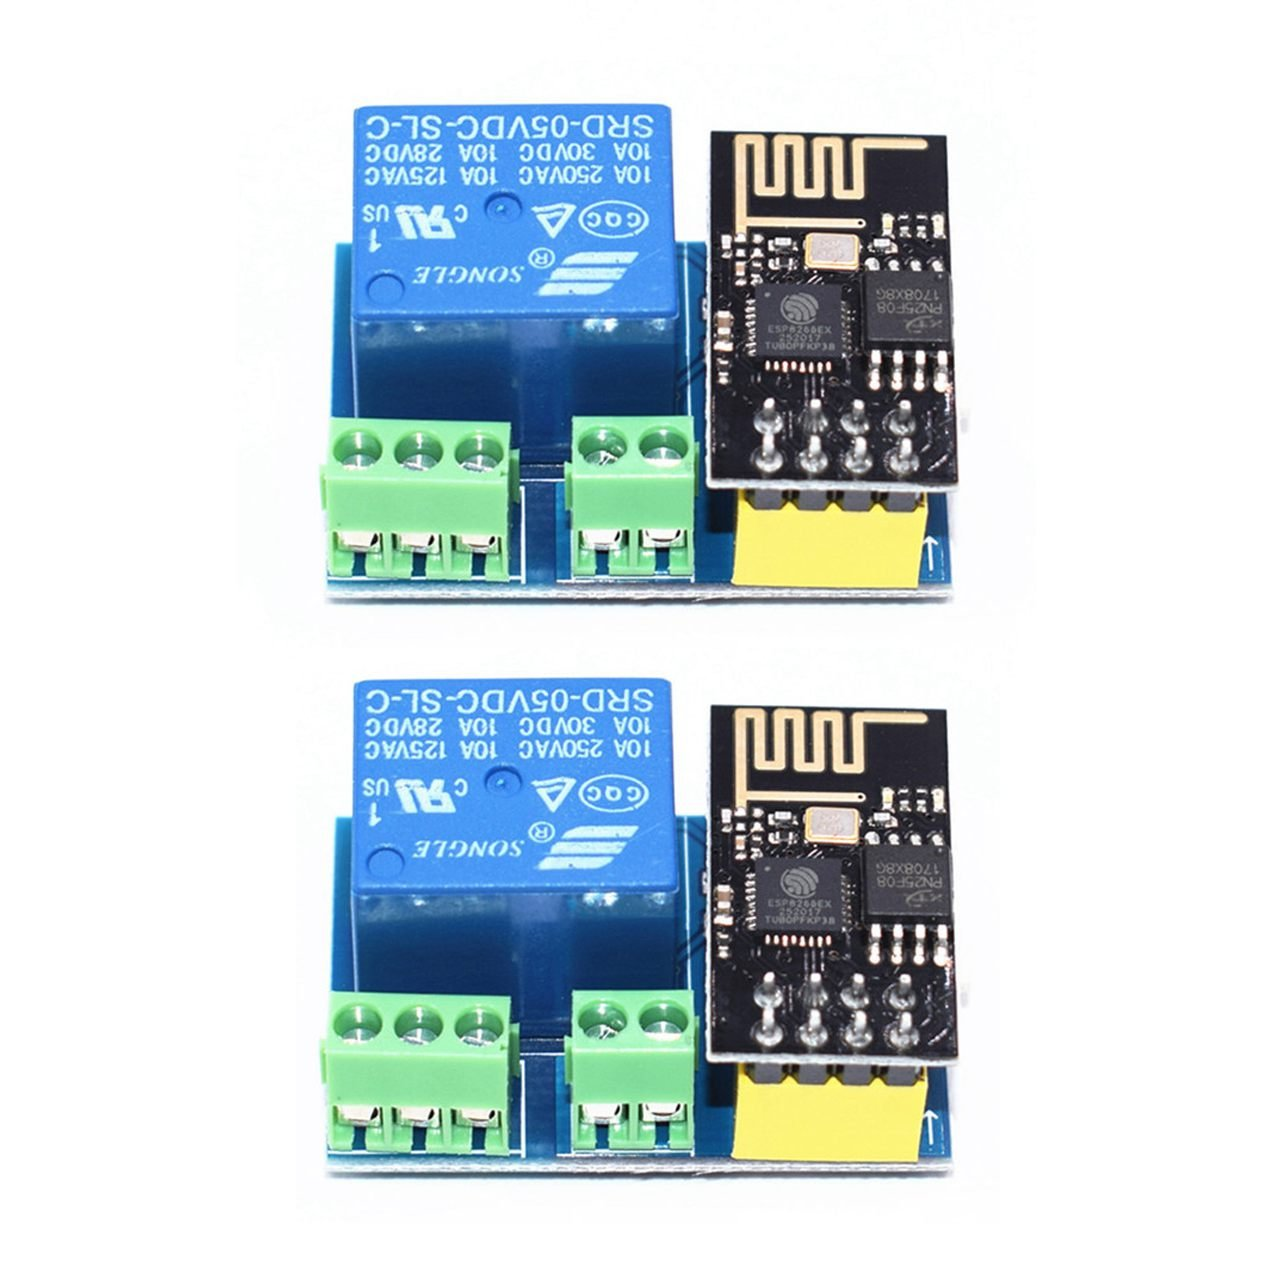 WOVELOT Modulo de Rele WiFi ESP8266 ESP-01S 5V Interruptor de Control Remoto Inteligente para el hogar para Arduino Aplicacion de telefono Modulo de WiFi inalambrico ESP01S